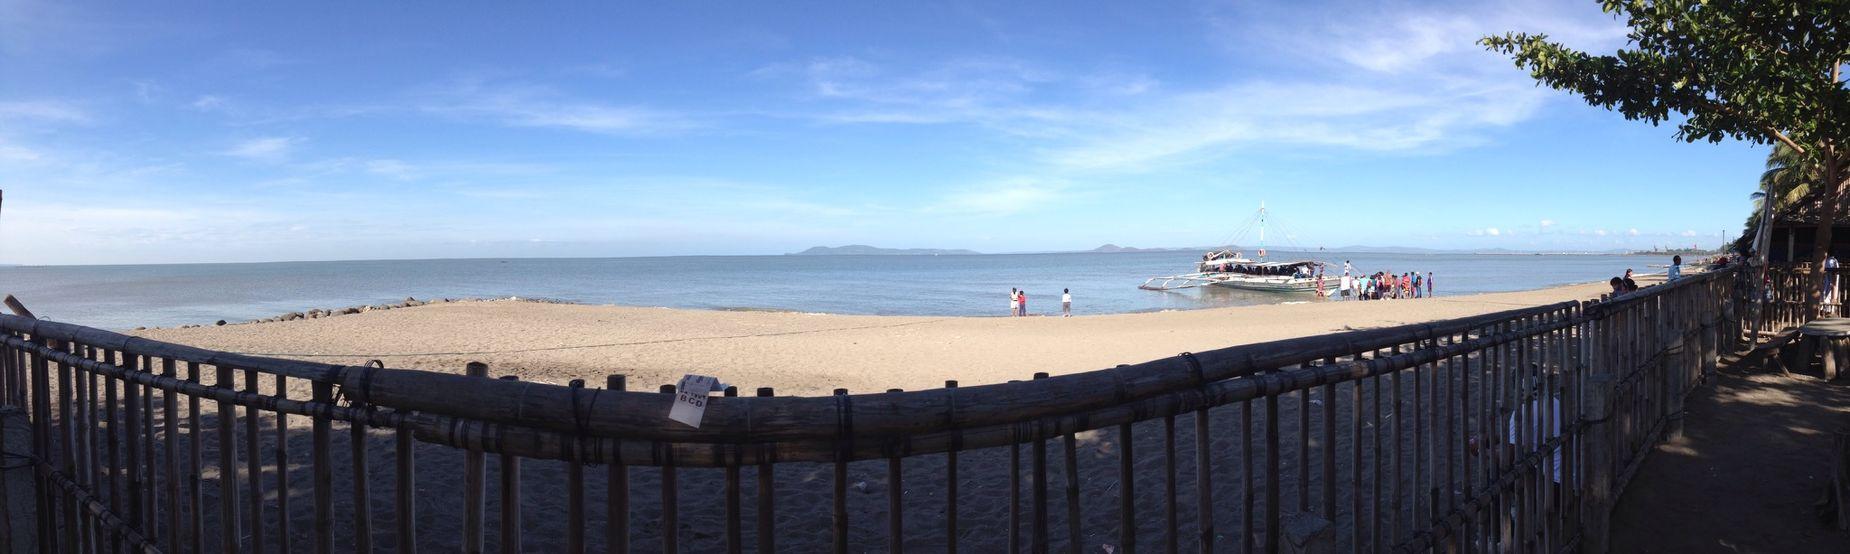 ohh beach!🌞 Enjoying Life